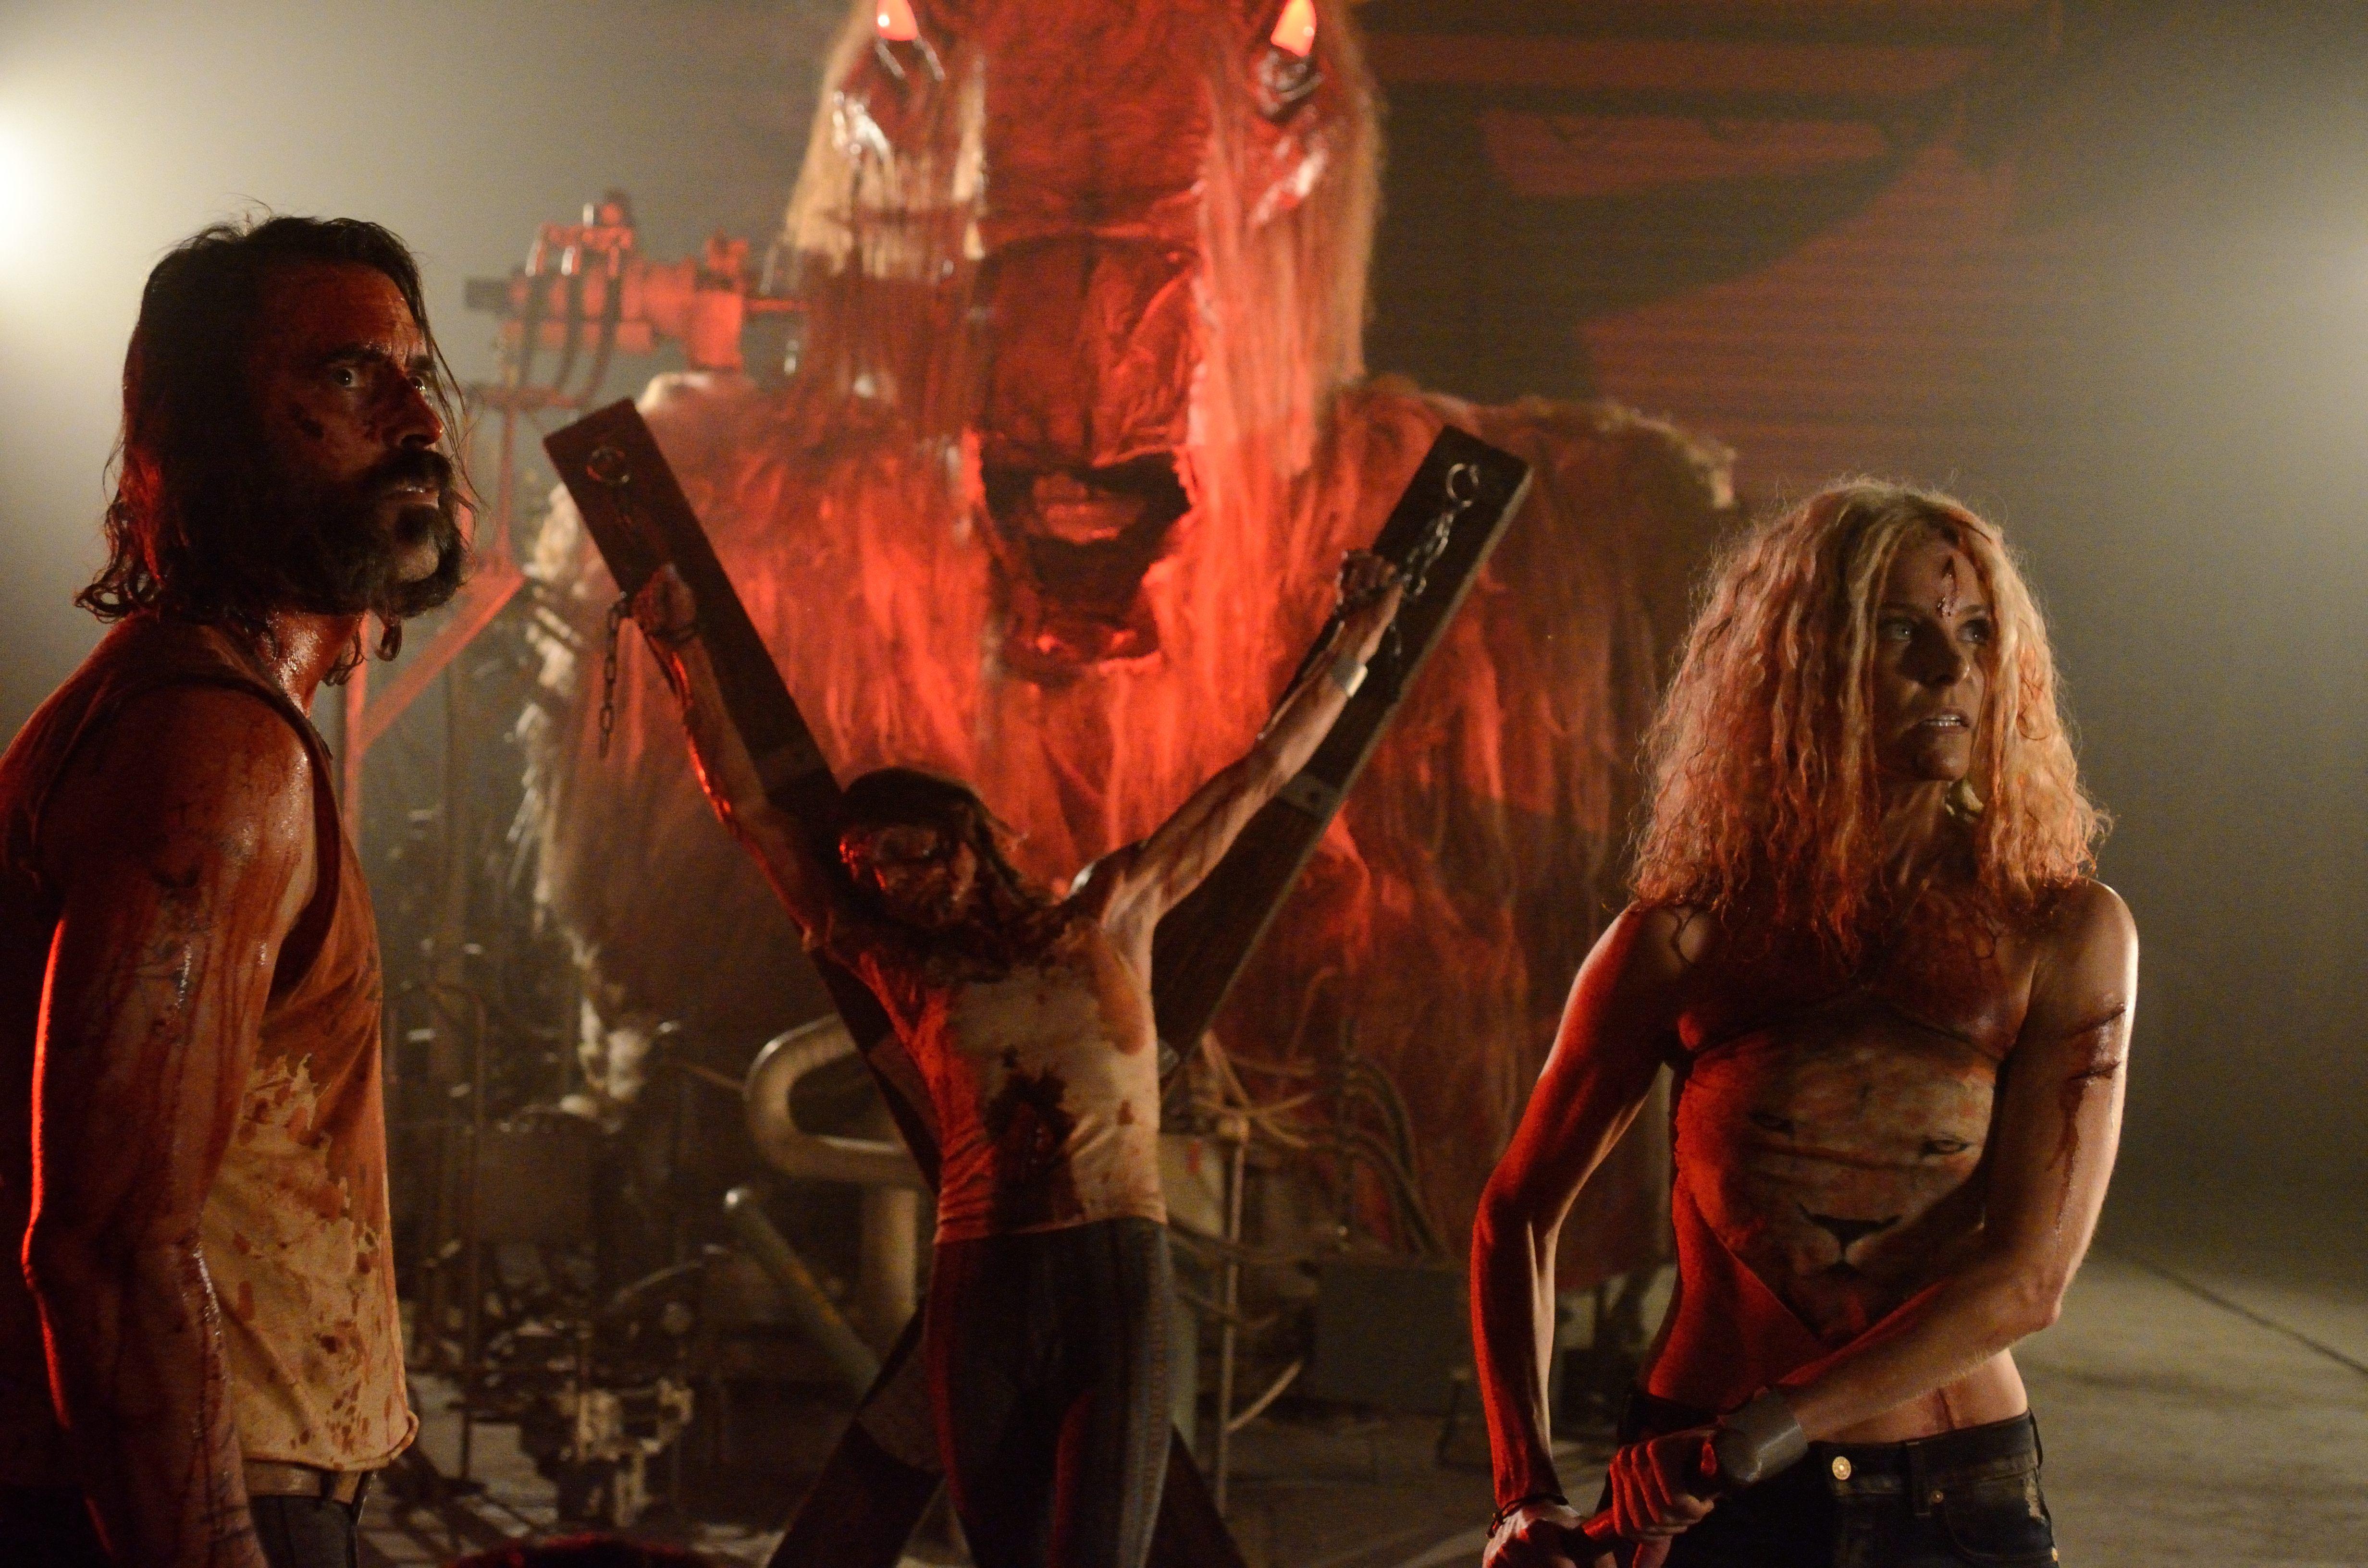 Rob Zombie's 31 to Make World Premiere at the 2016 Sundance Film Festival